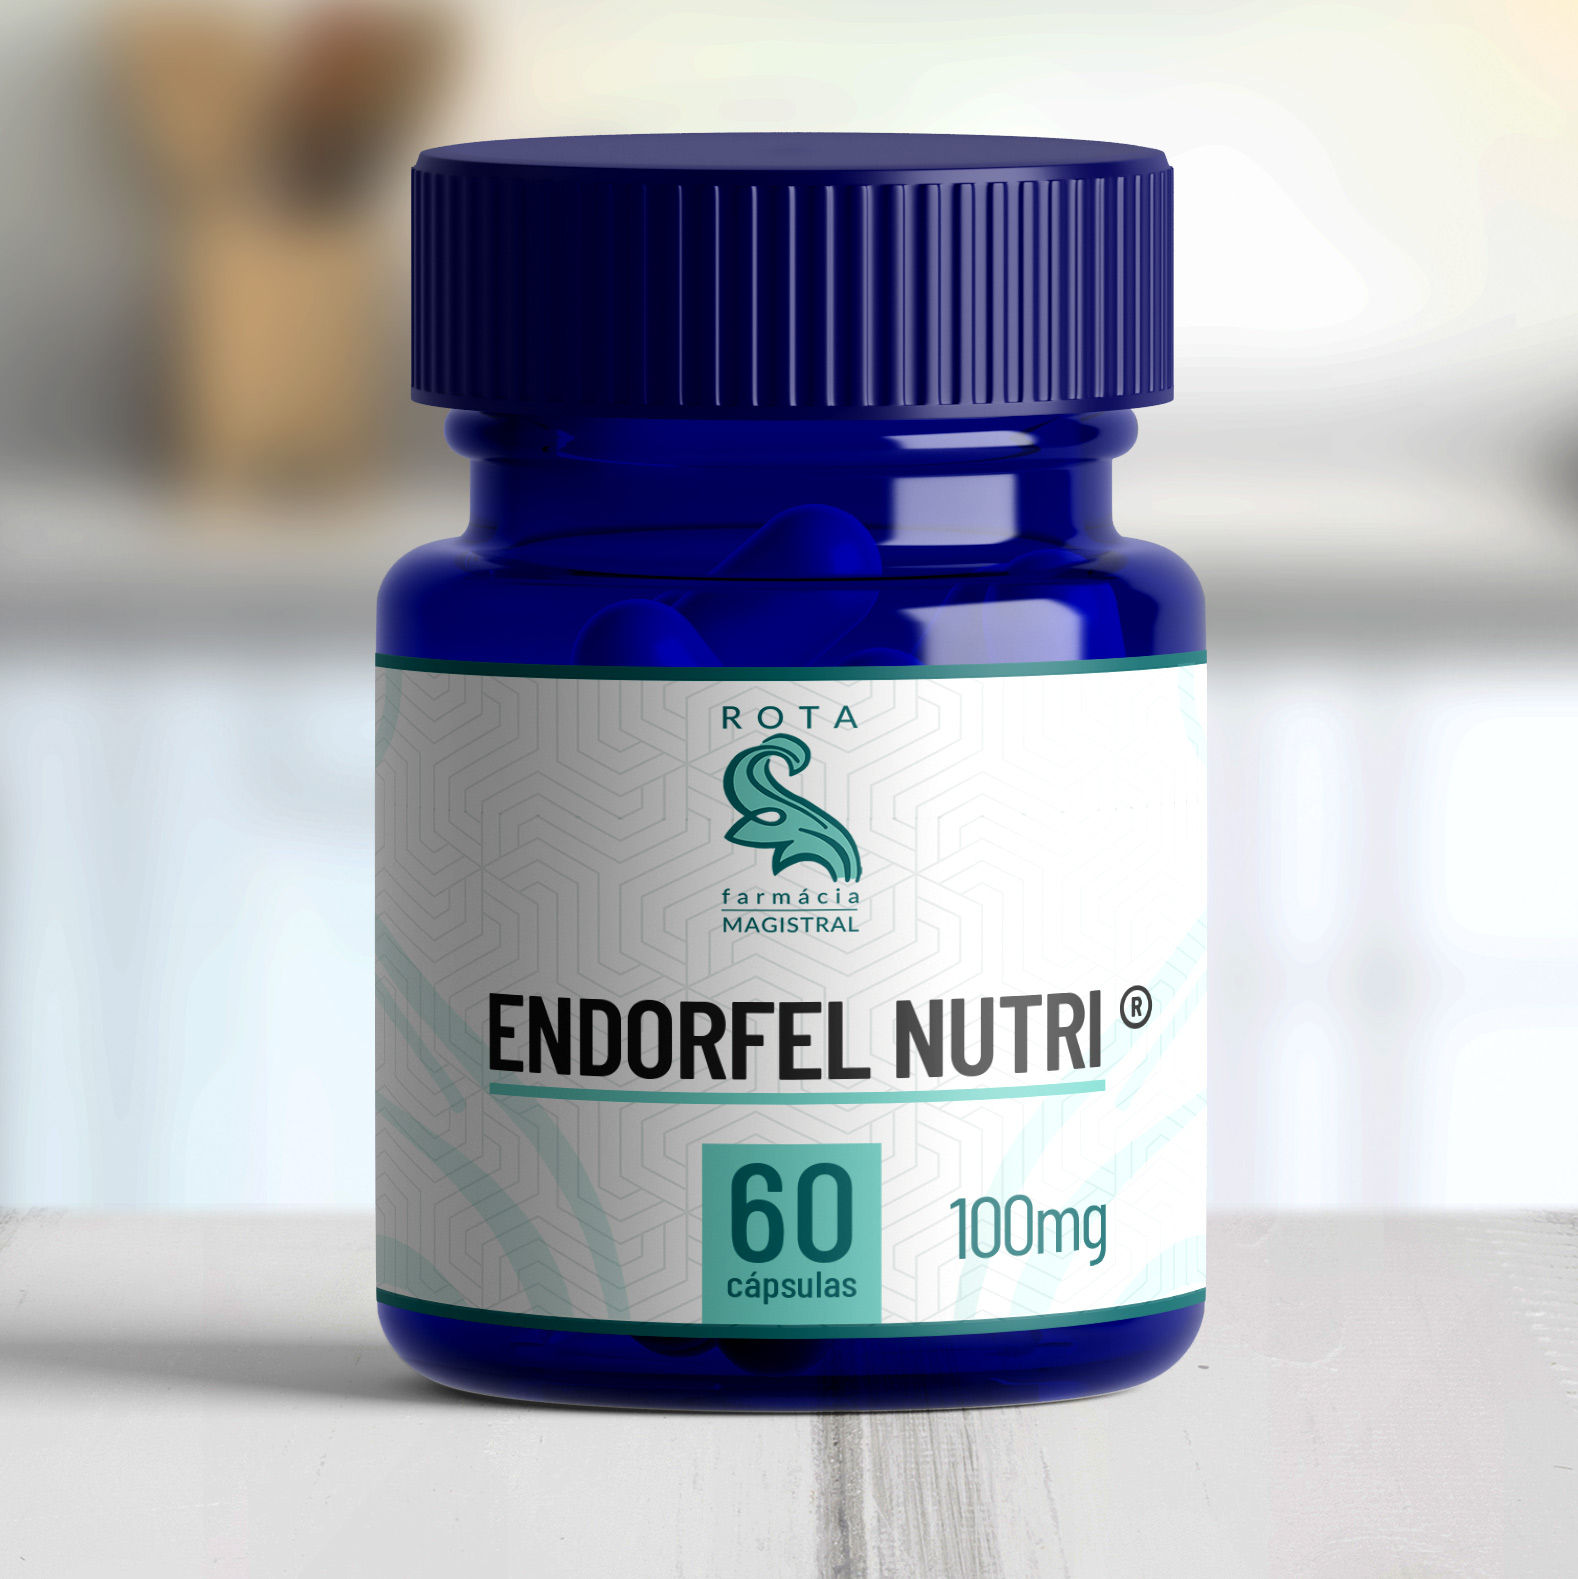 Endorfeel Nutri ® 100mg 60 cápsulas